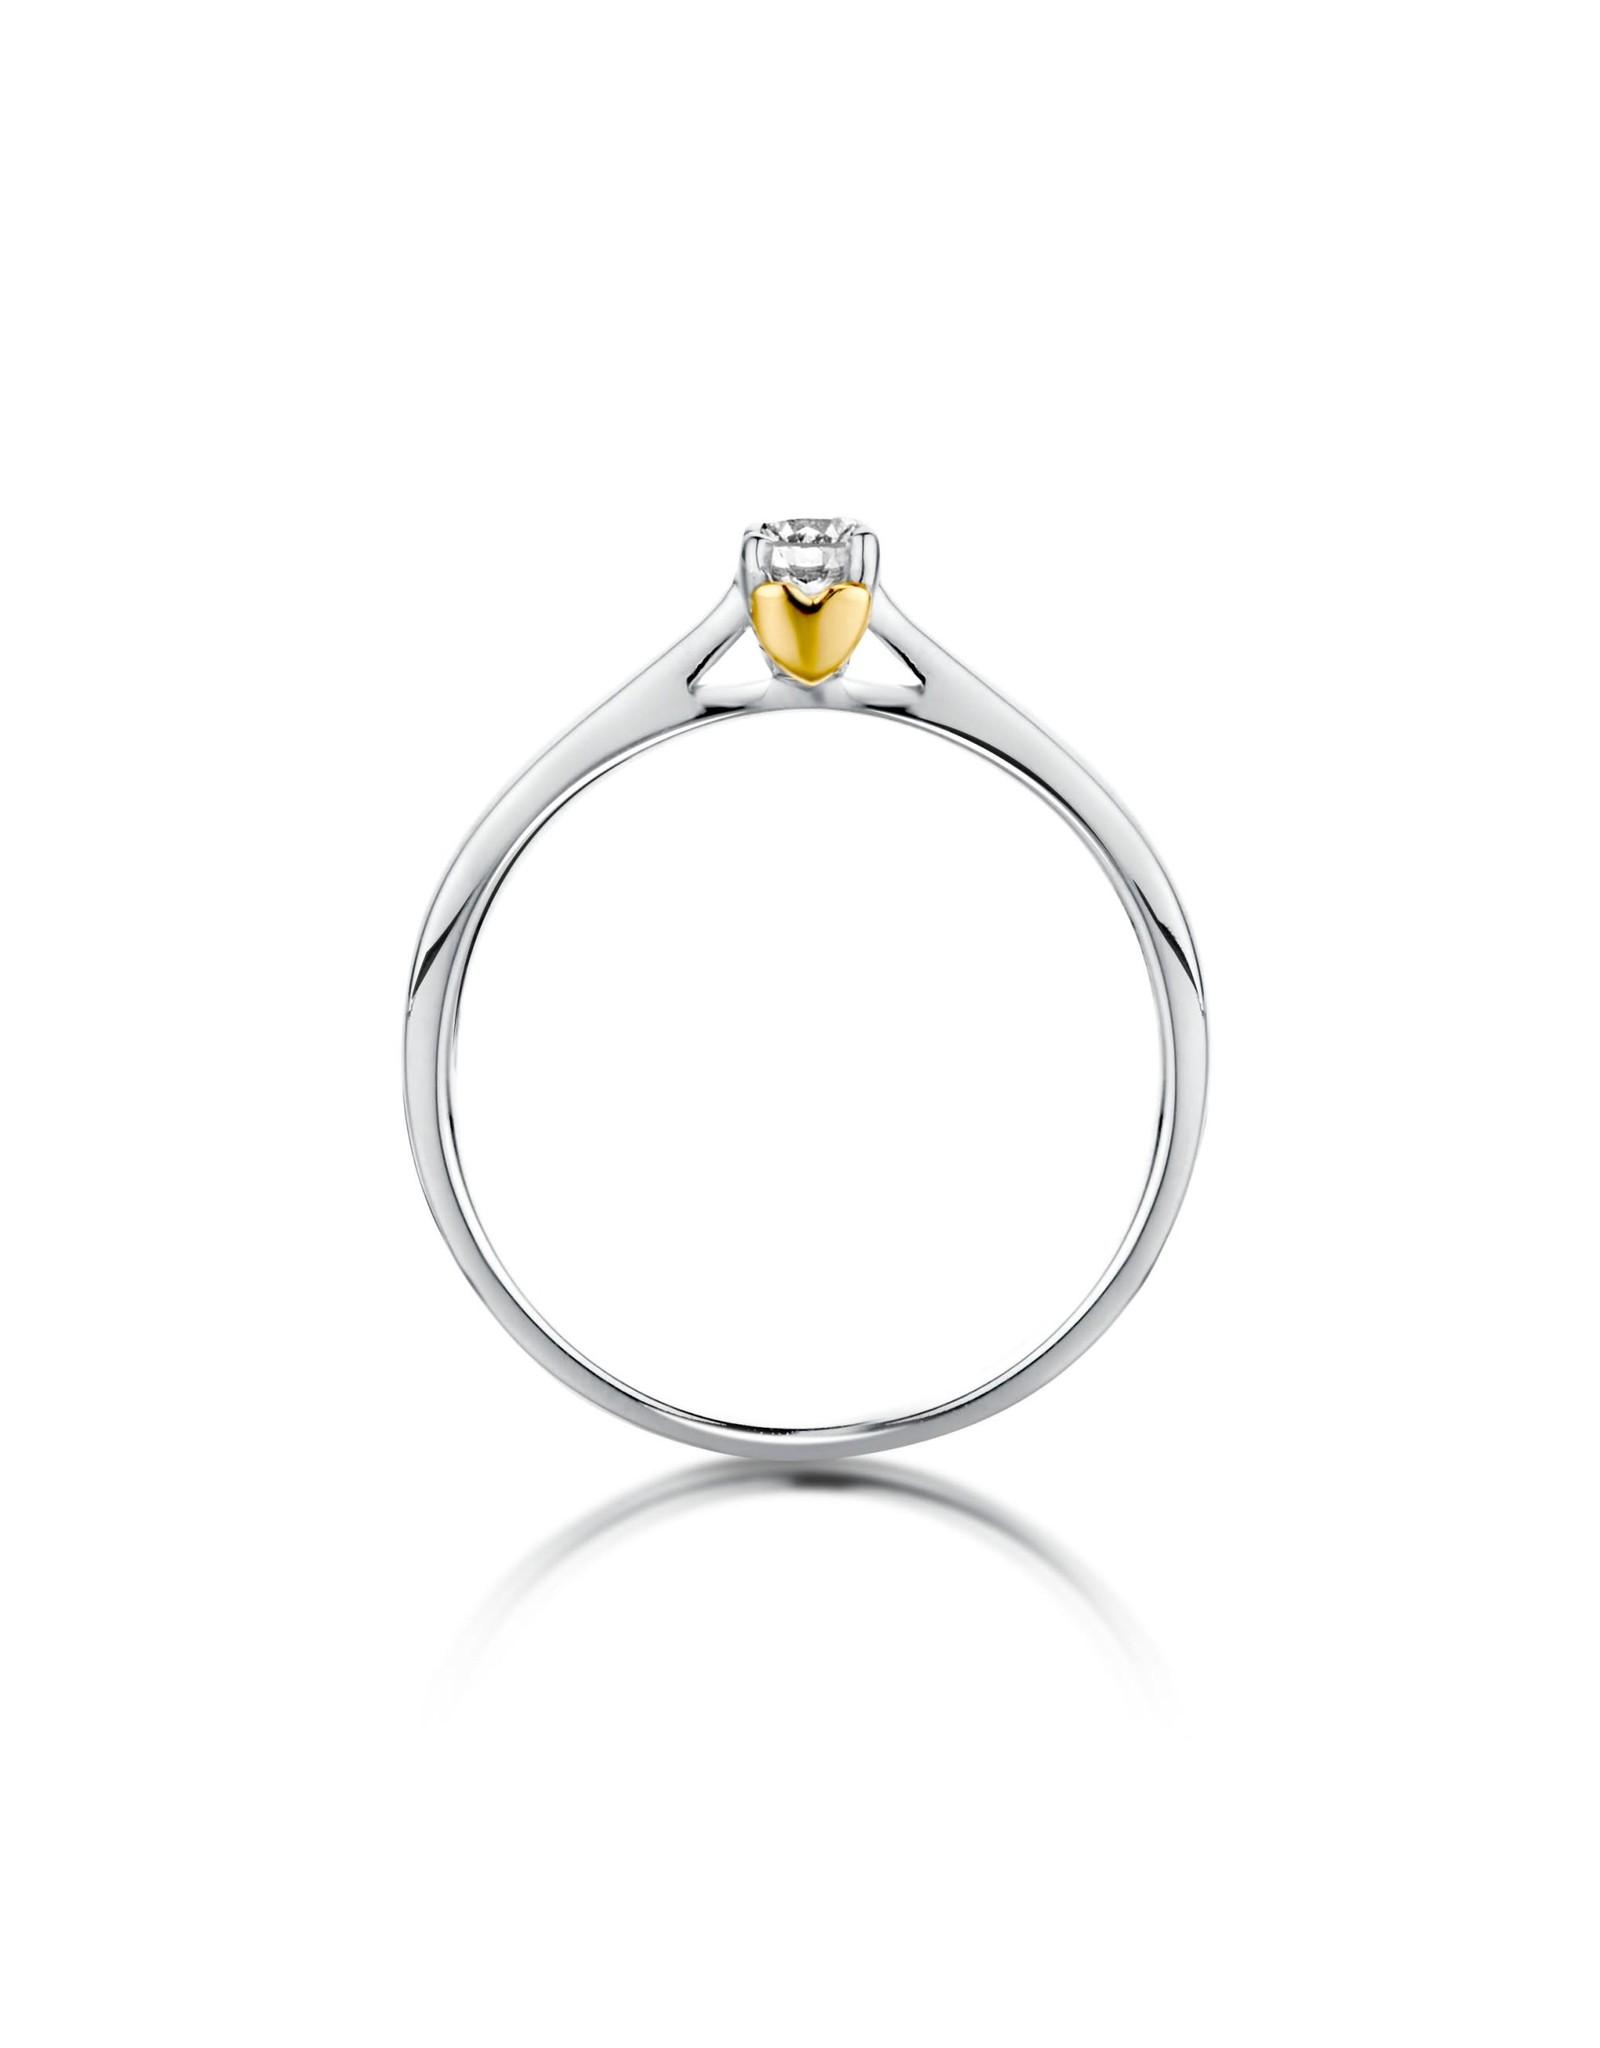 Dulci Nea Ring Bicolor Wit/Geel Goud 18kt R45769A